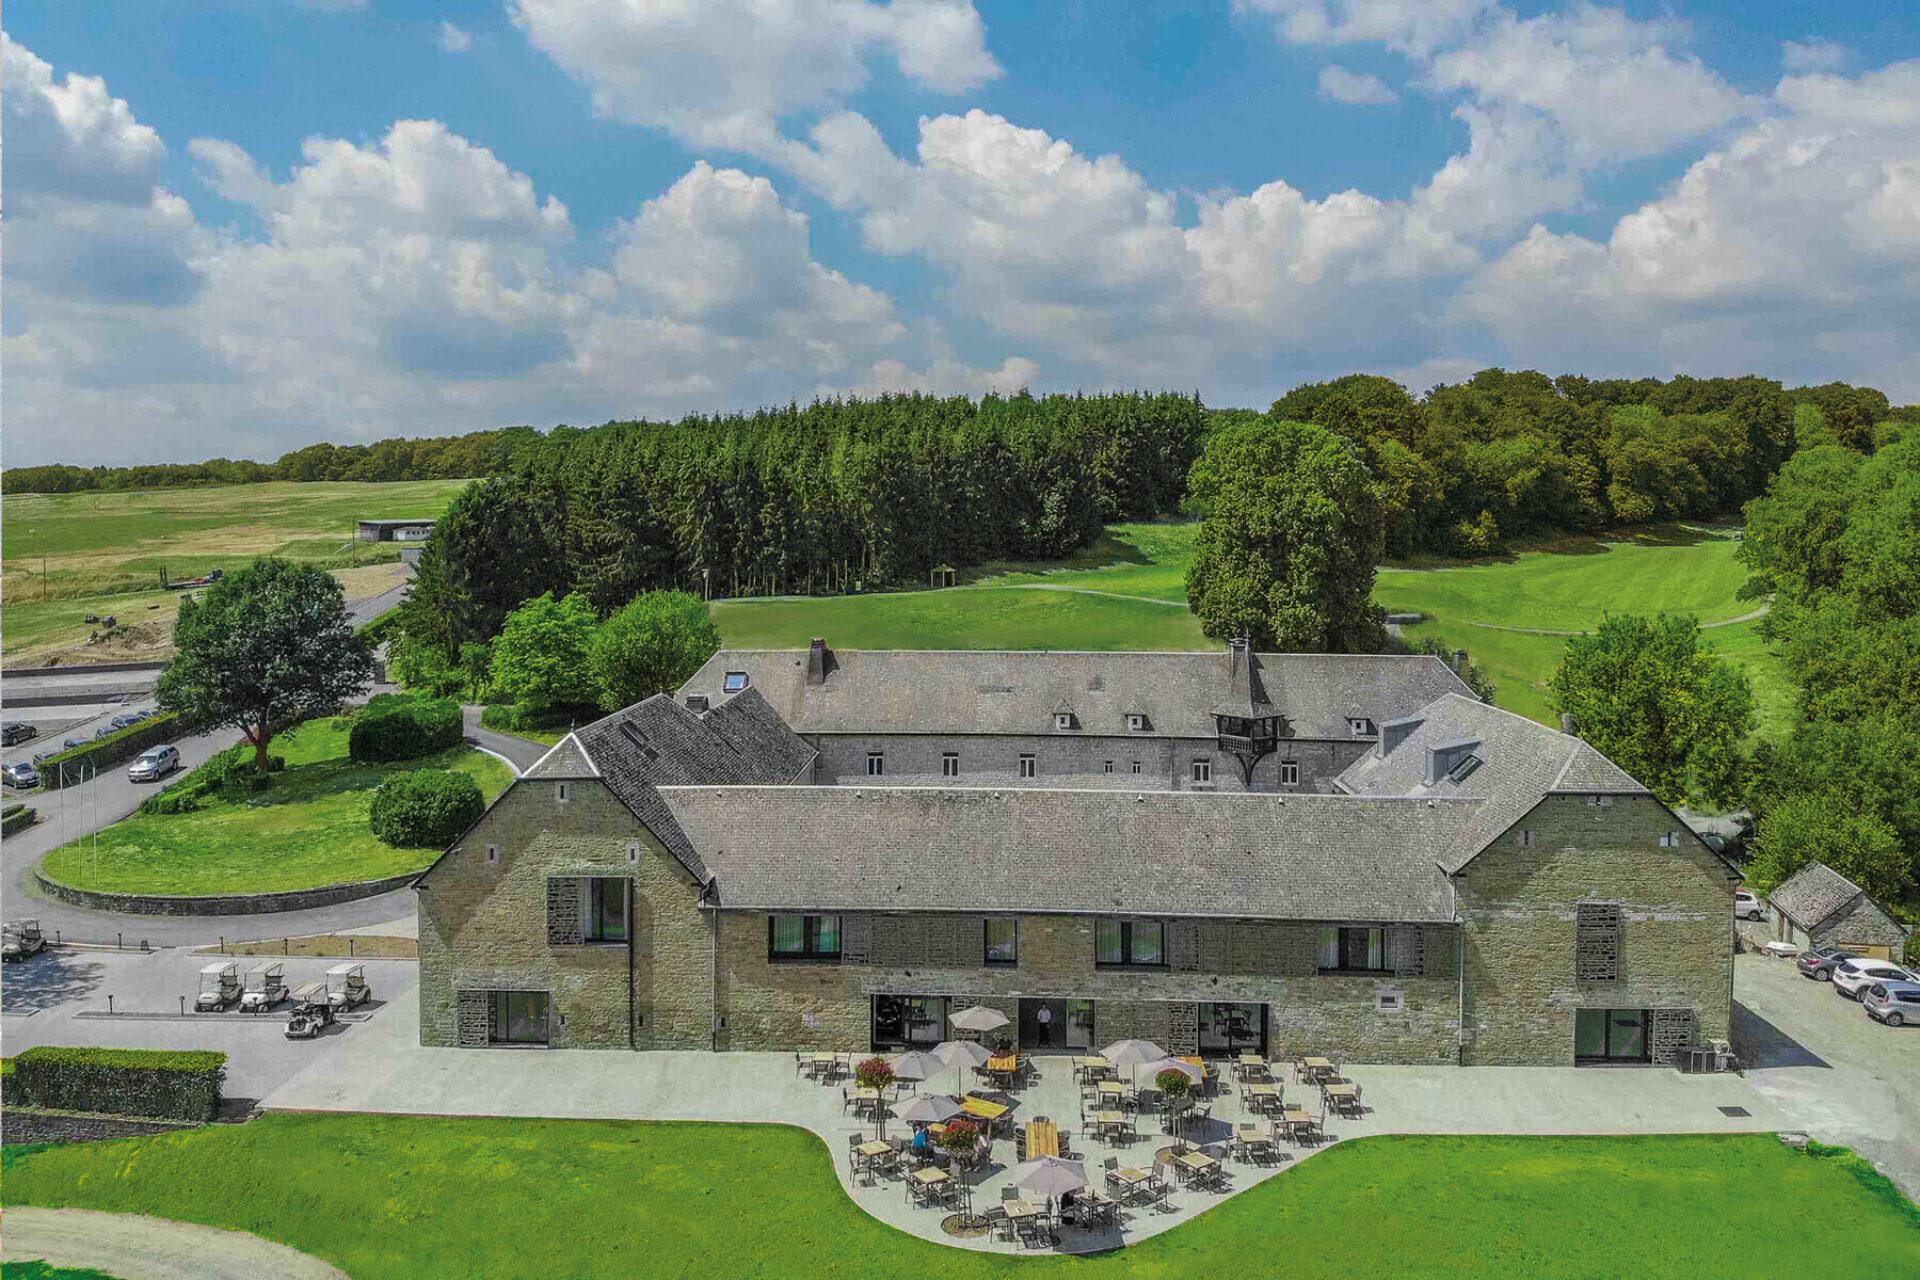 Belgie Five Nations Golfhotel bird view hotel